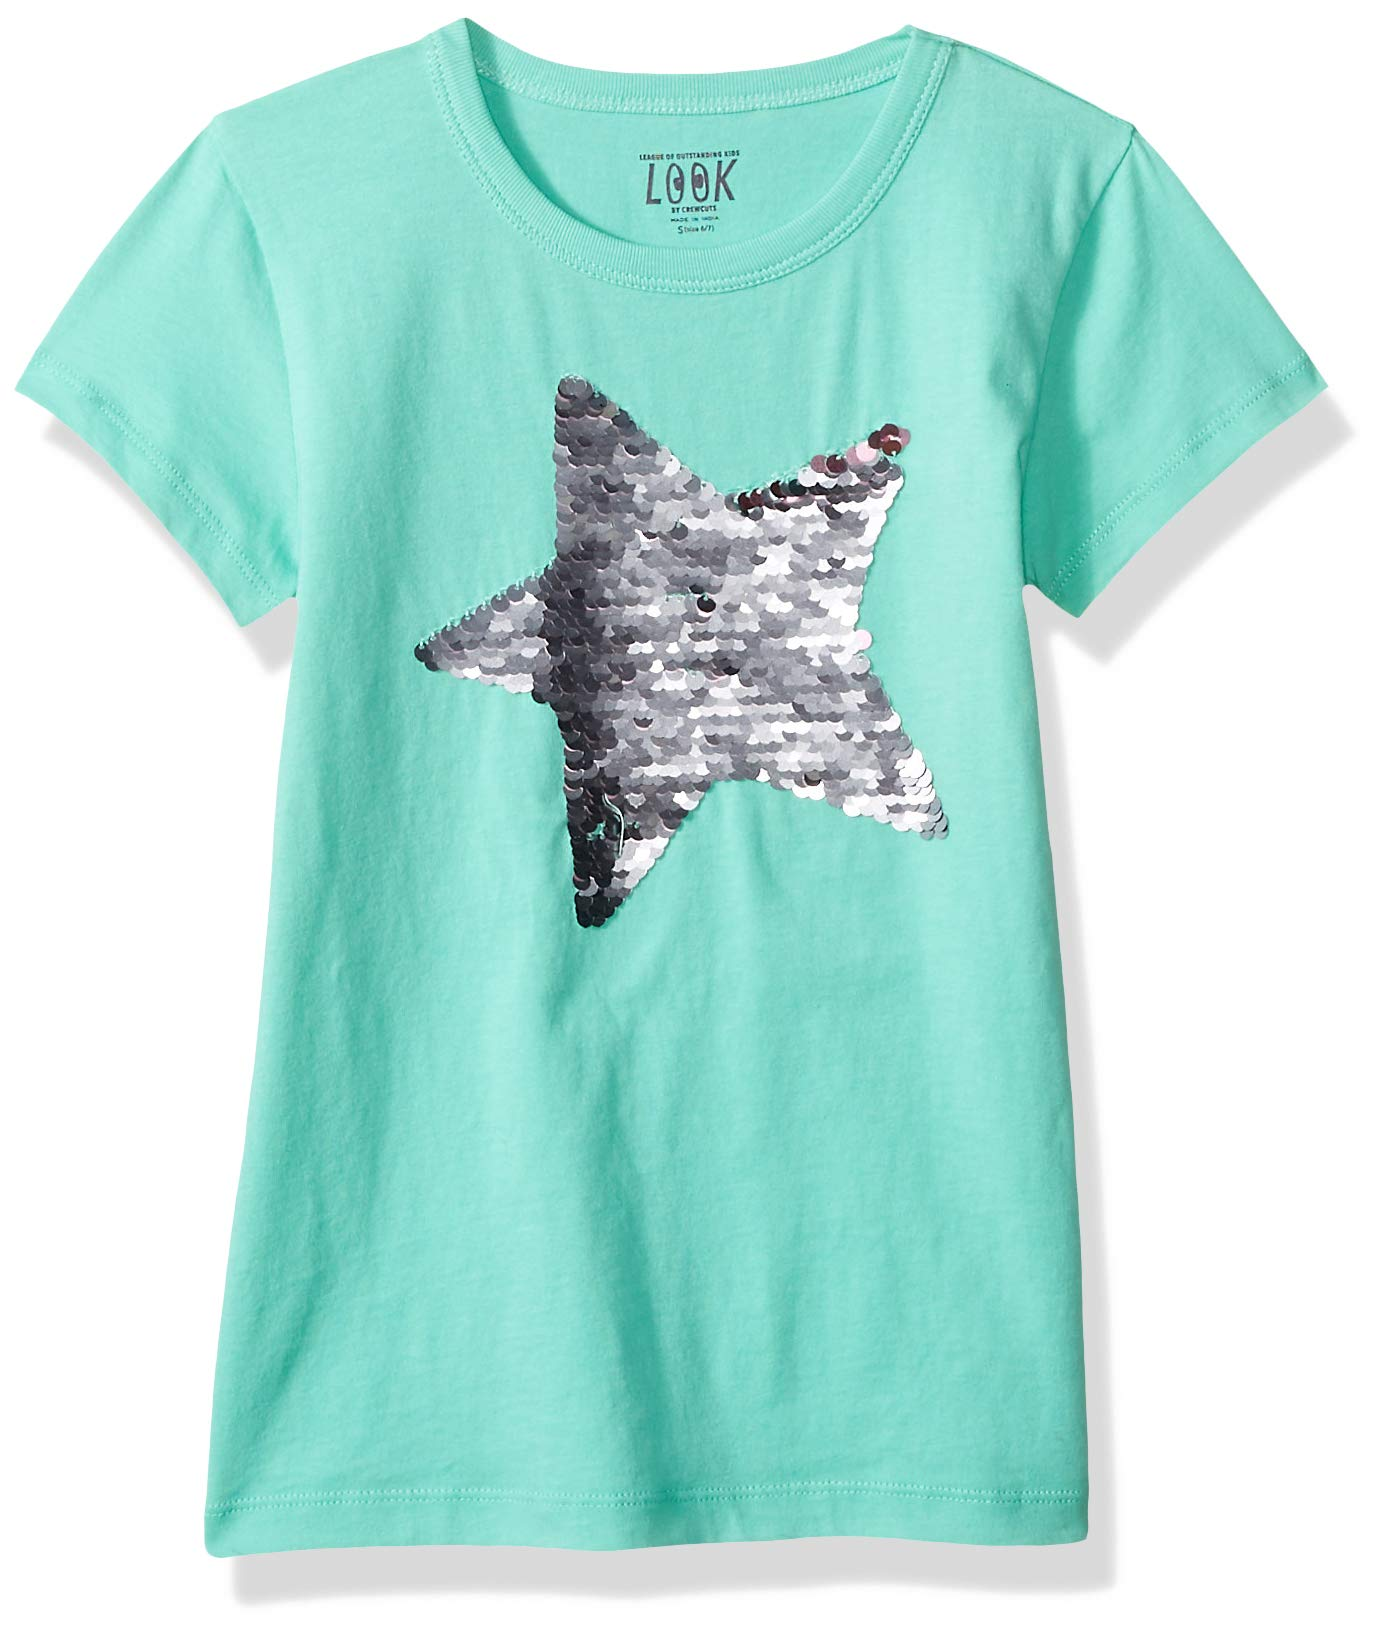 // J Crew Brand LOOK by crewcuts Girls Short Sleeve Peplum tee